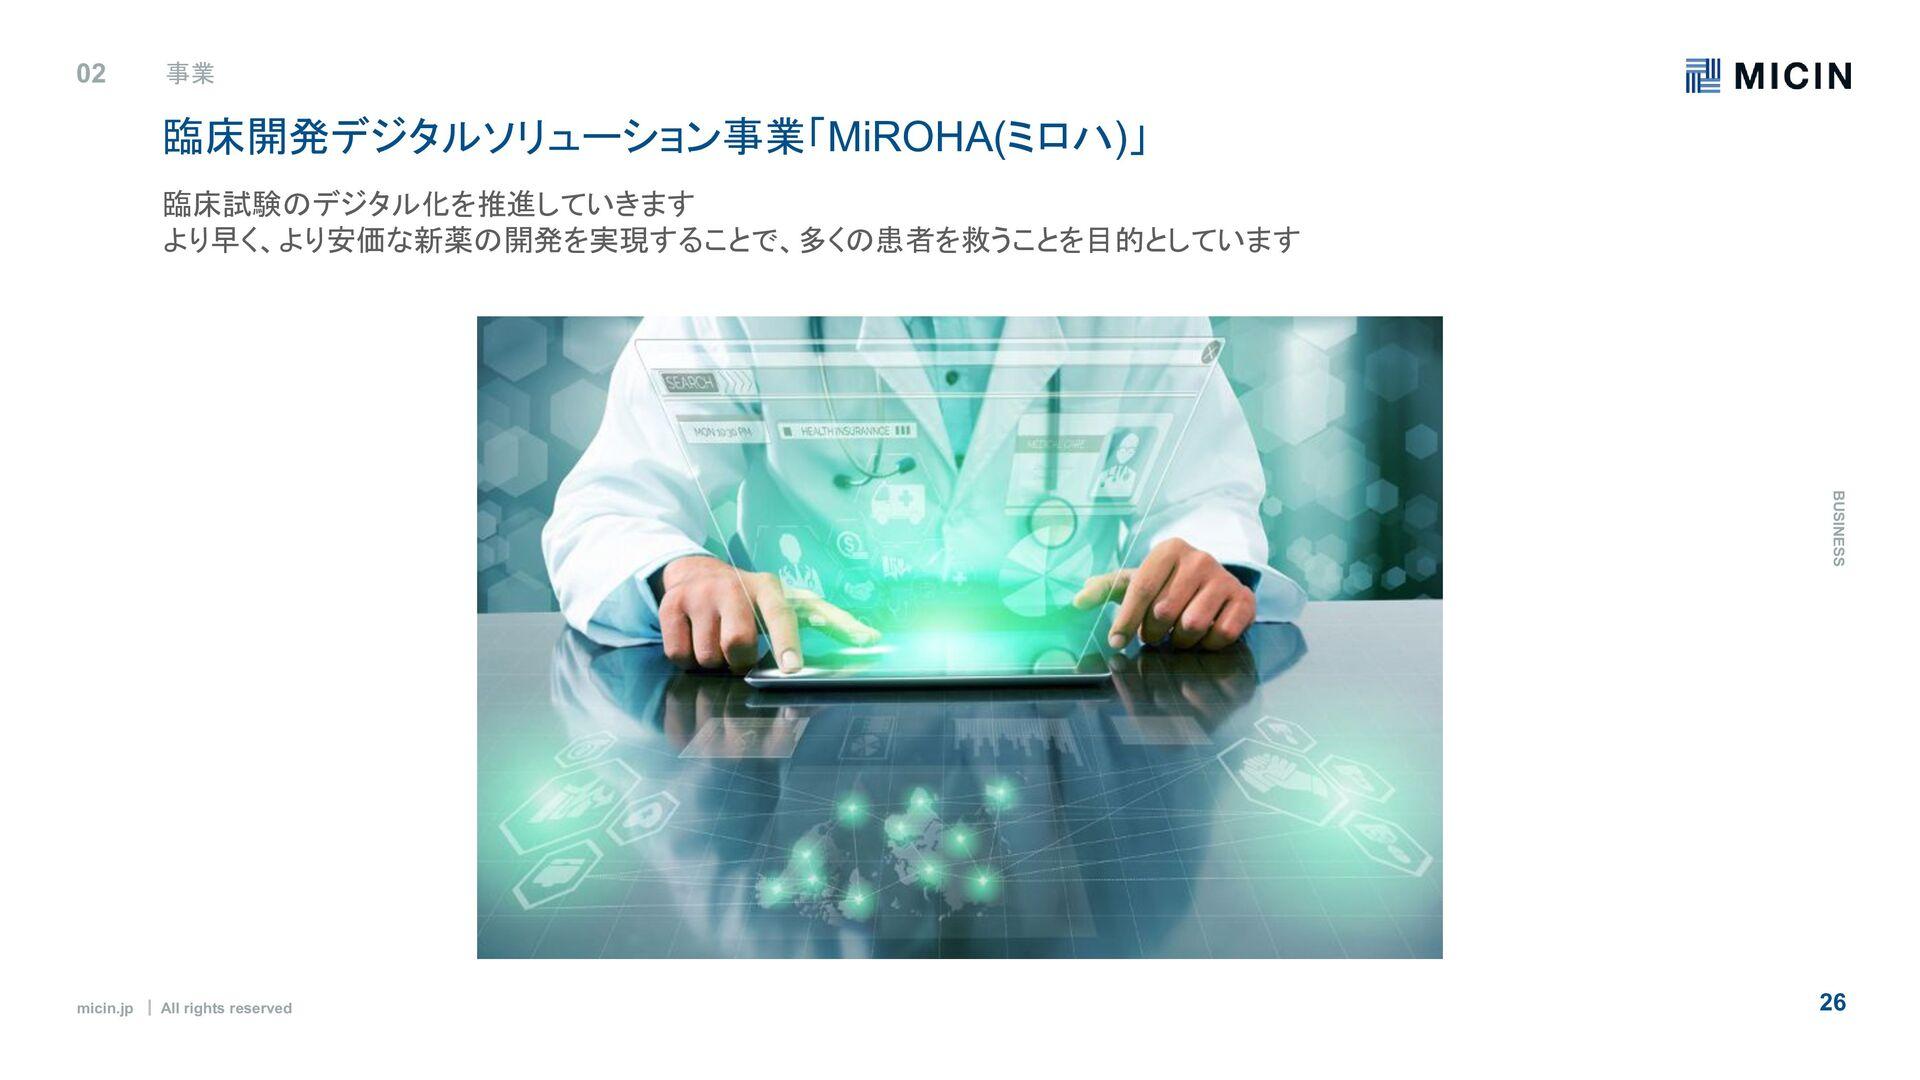 micin.jp   All rights reserved 2 6 micin.jp   A...